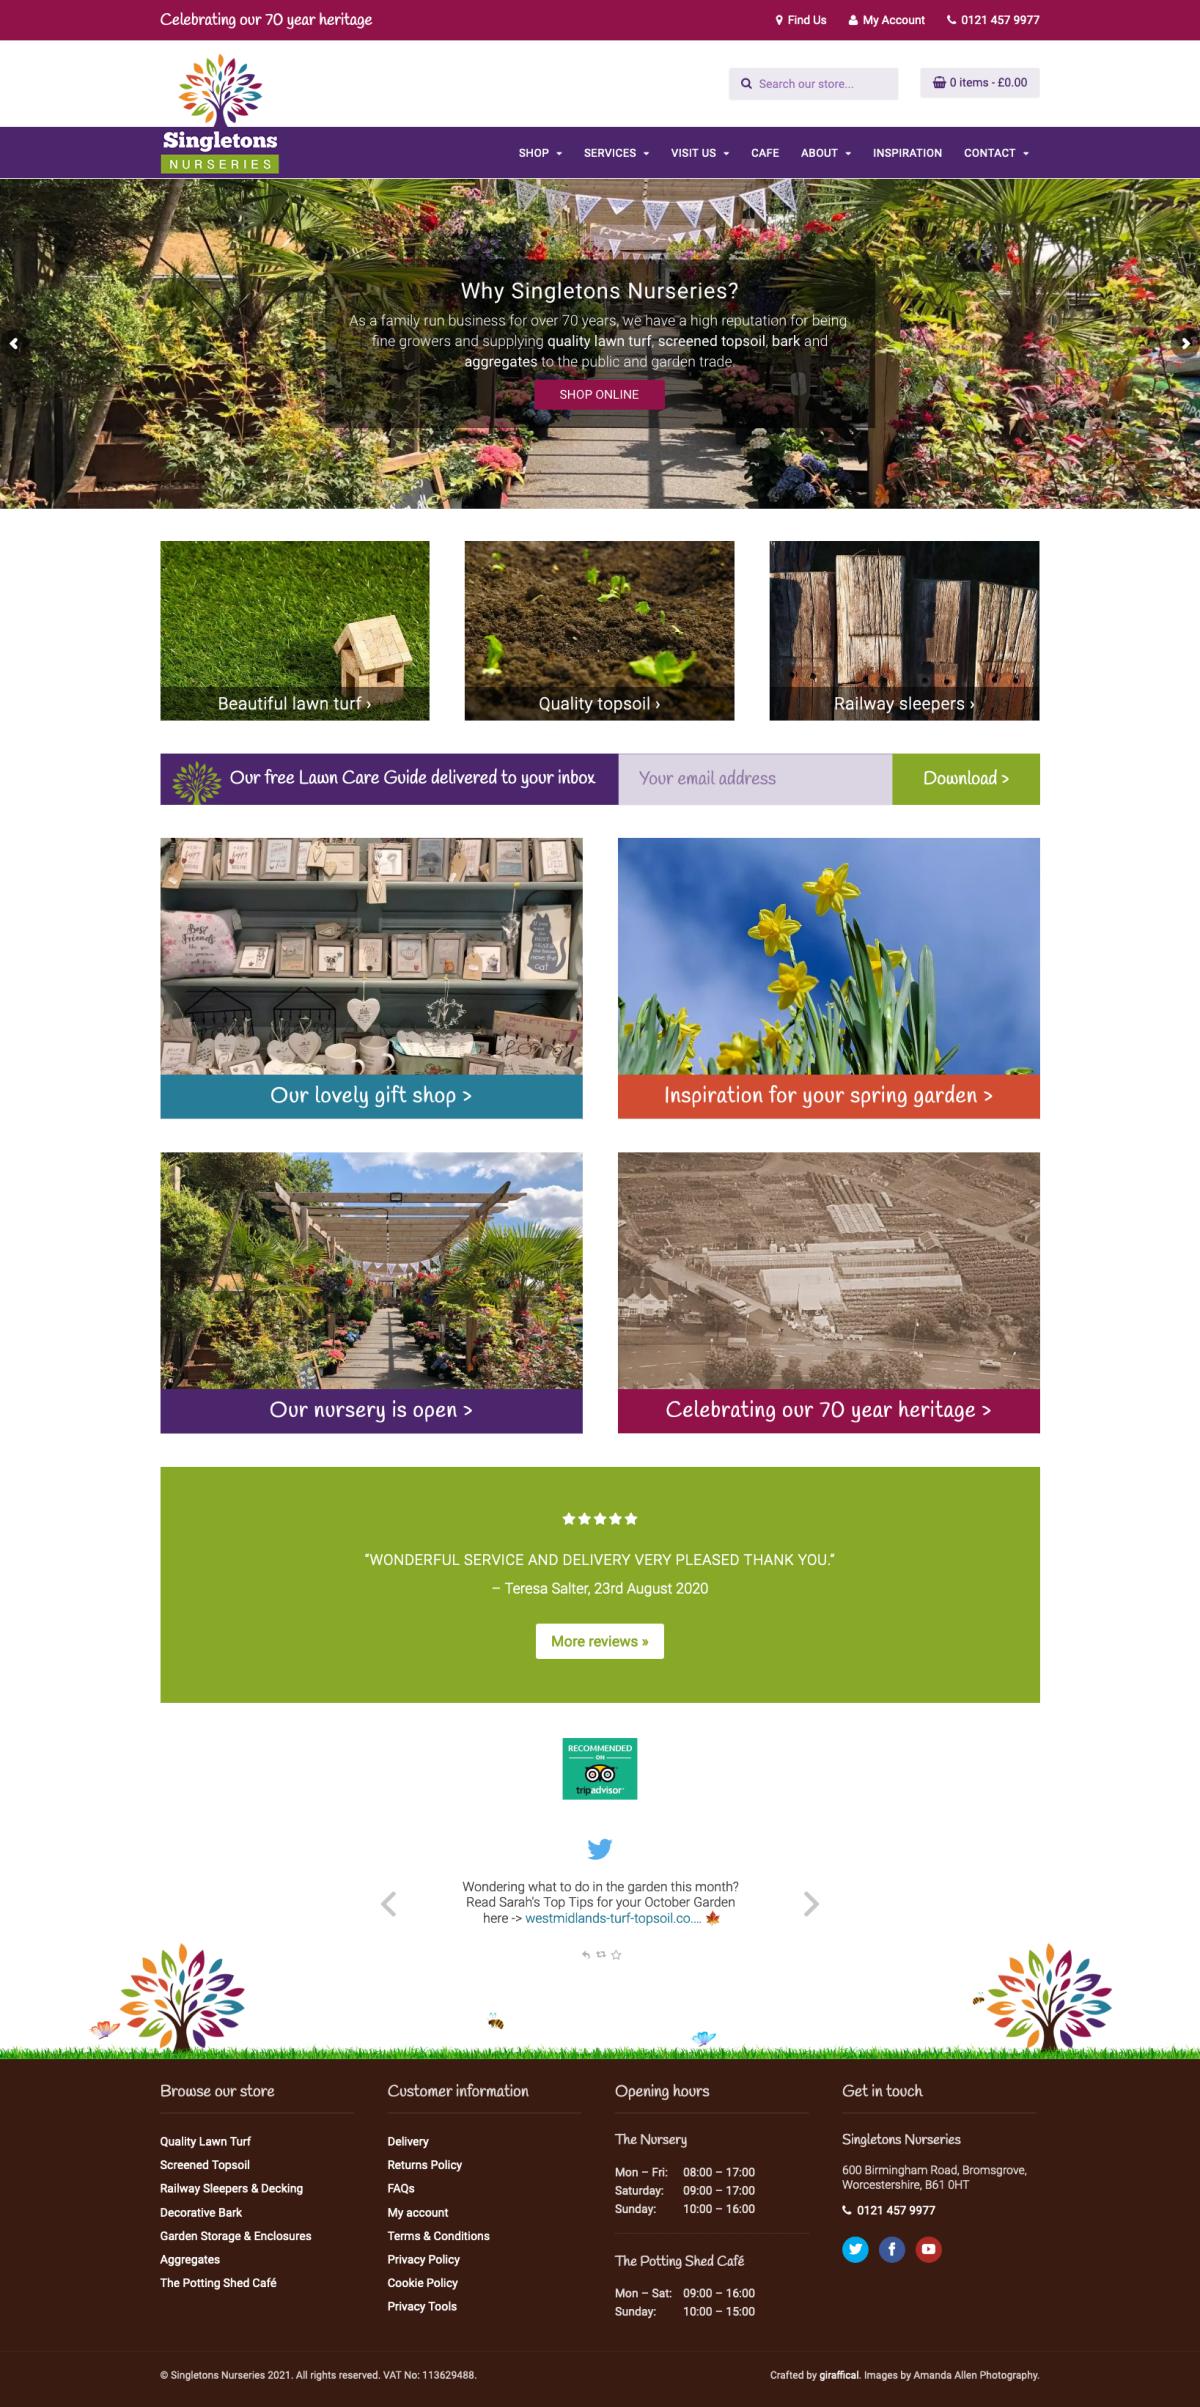 Garden Centre Website Design - Singletons Nurseries - Home Page